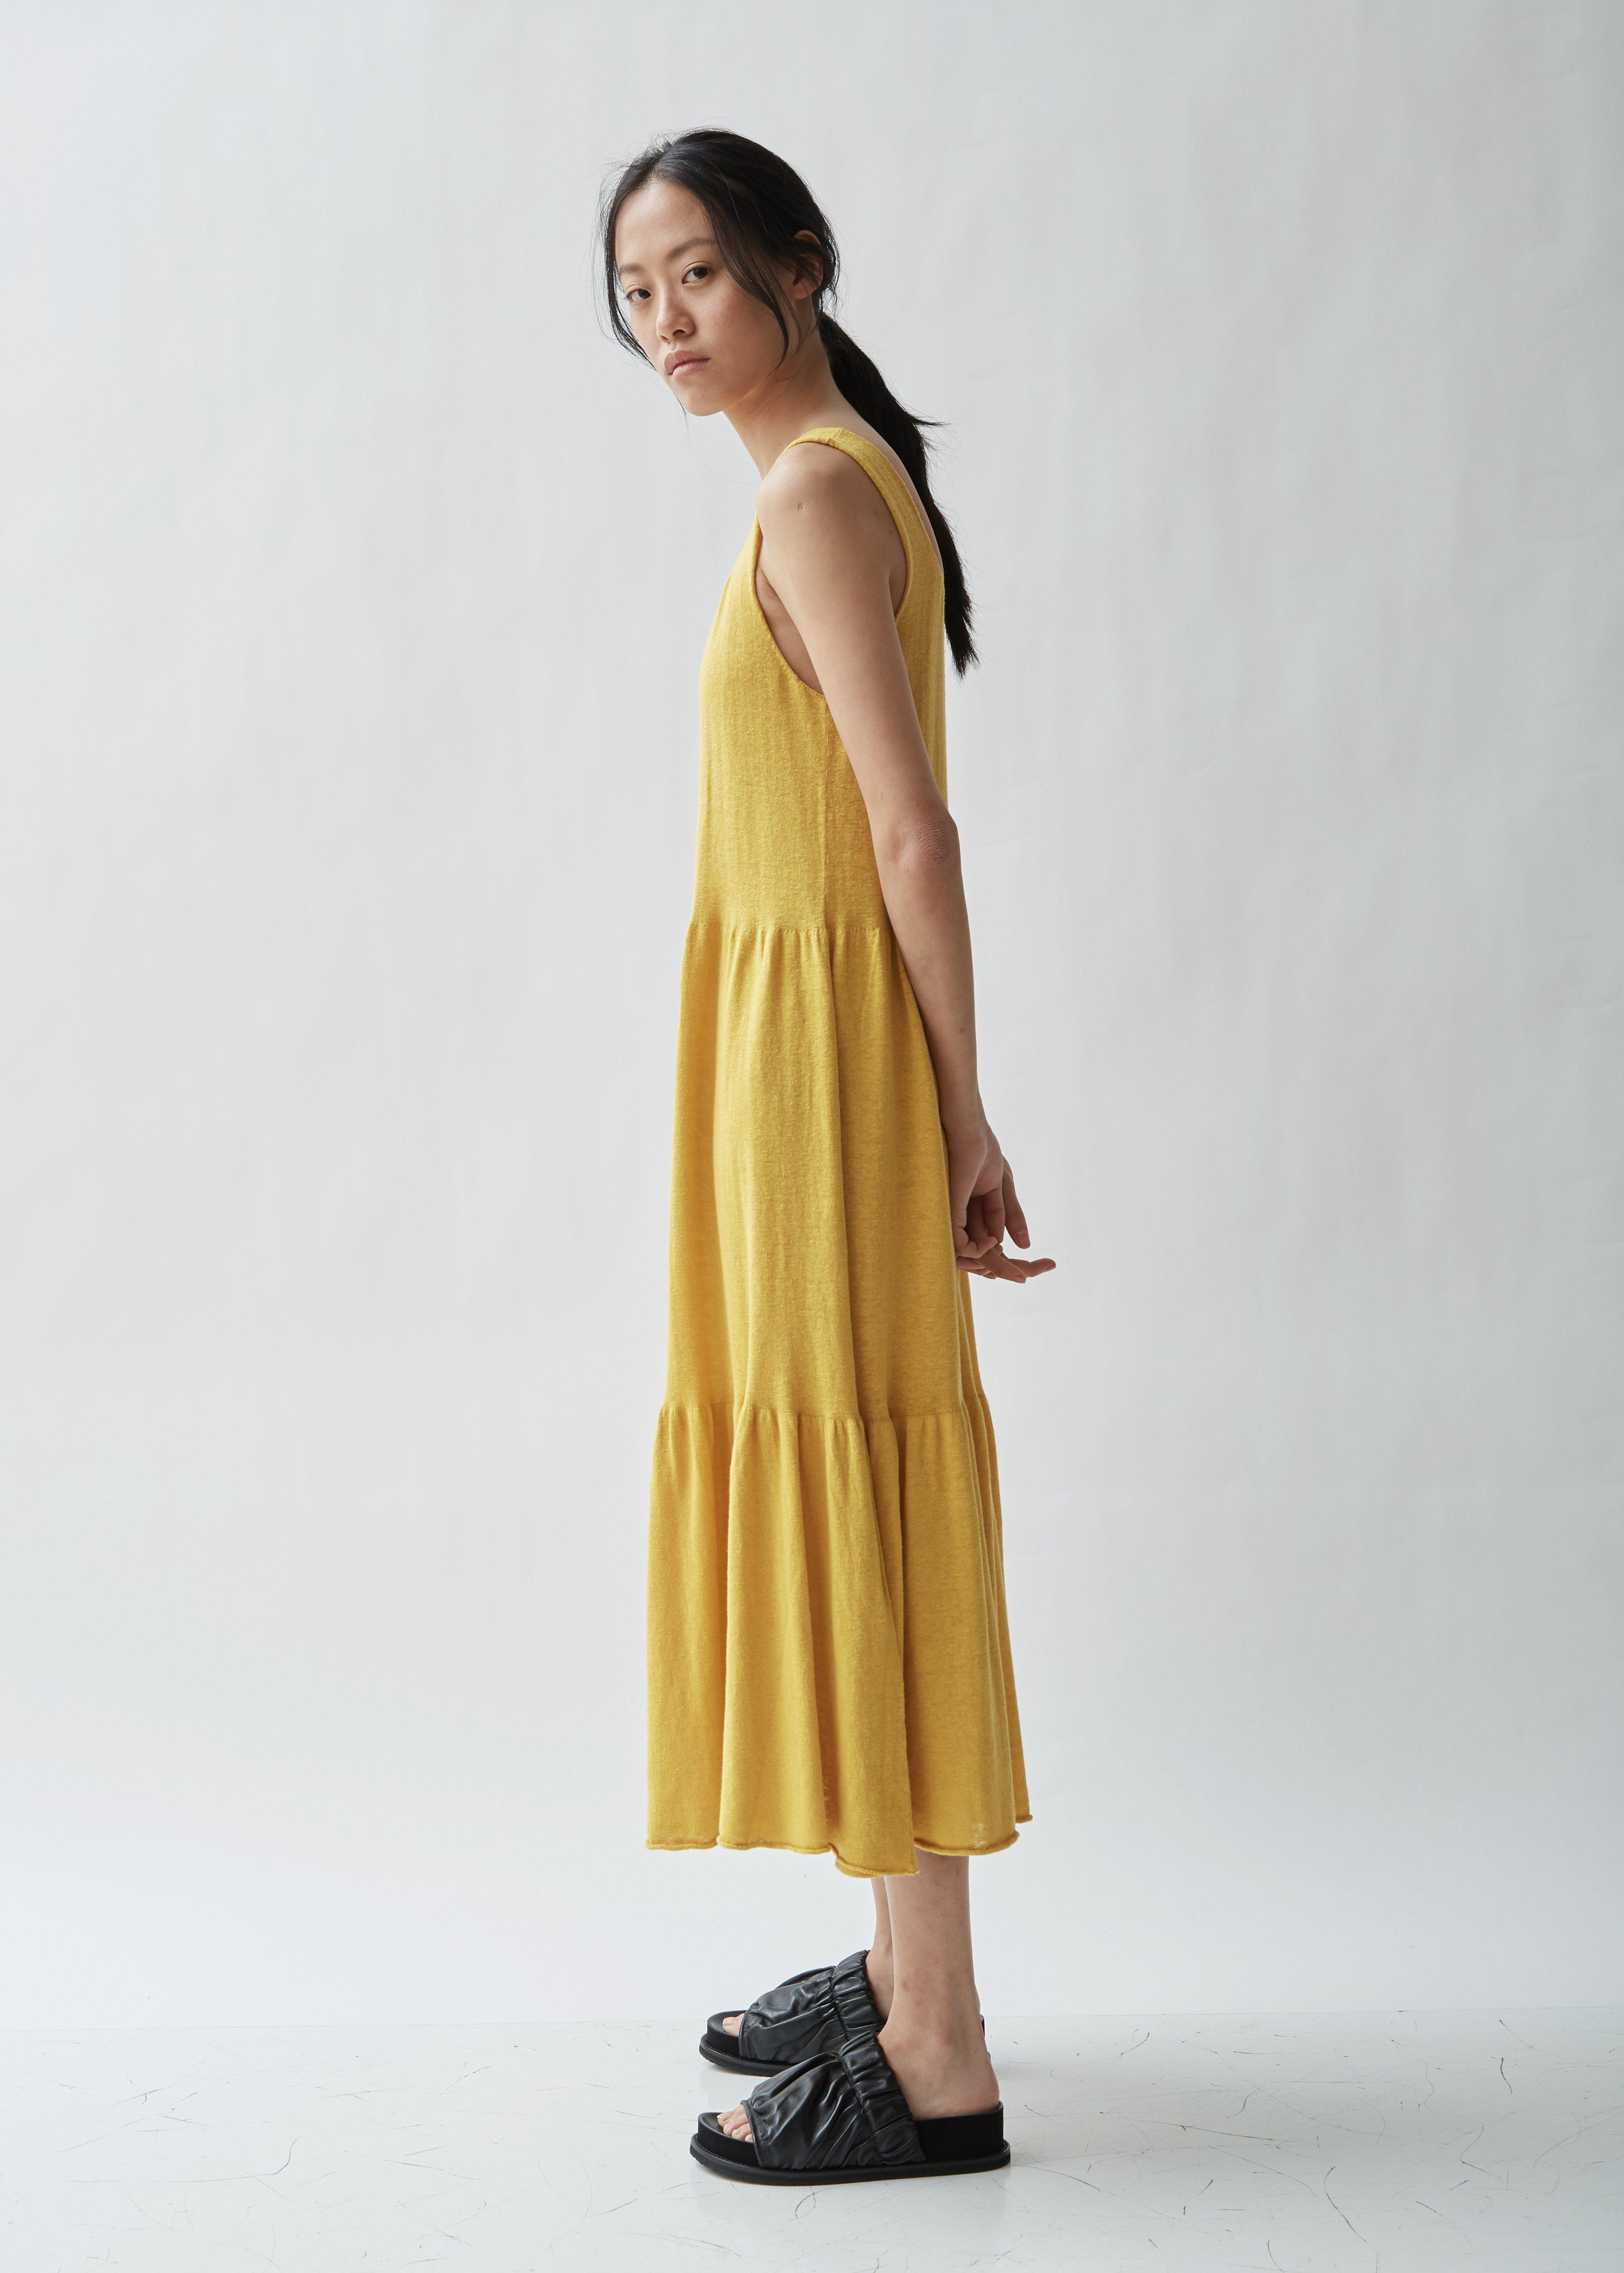 c29f0dc128 Lyst - Lauren Manoogian Tier Sleeveless Dress